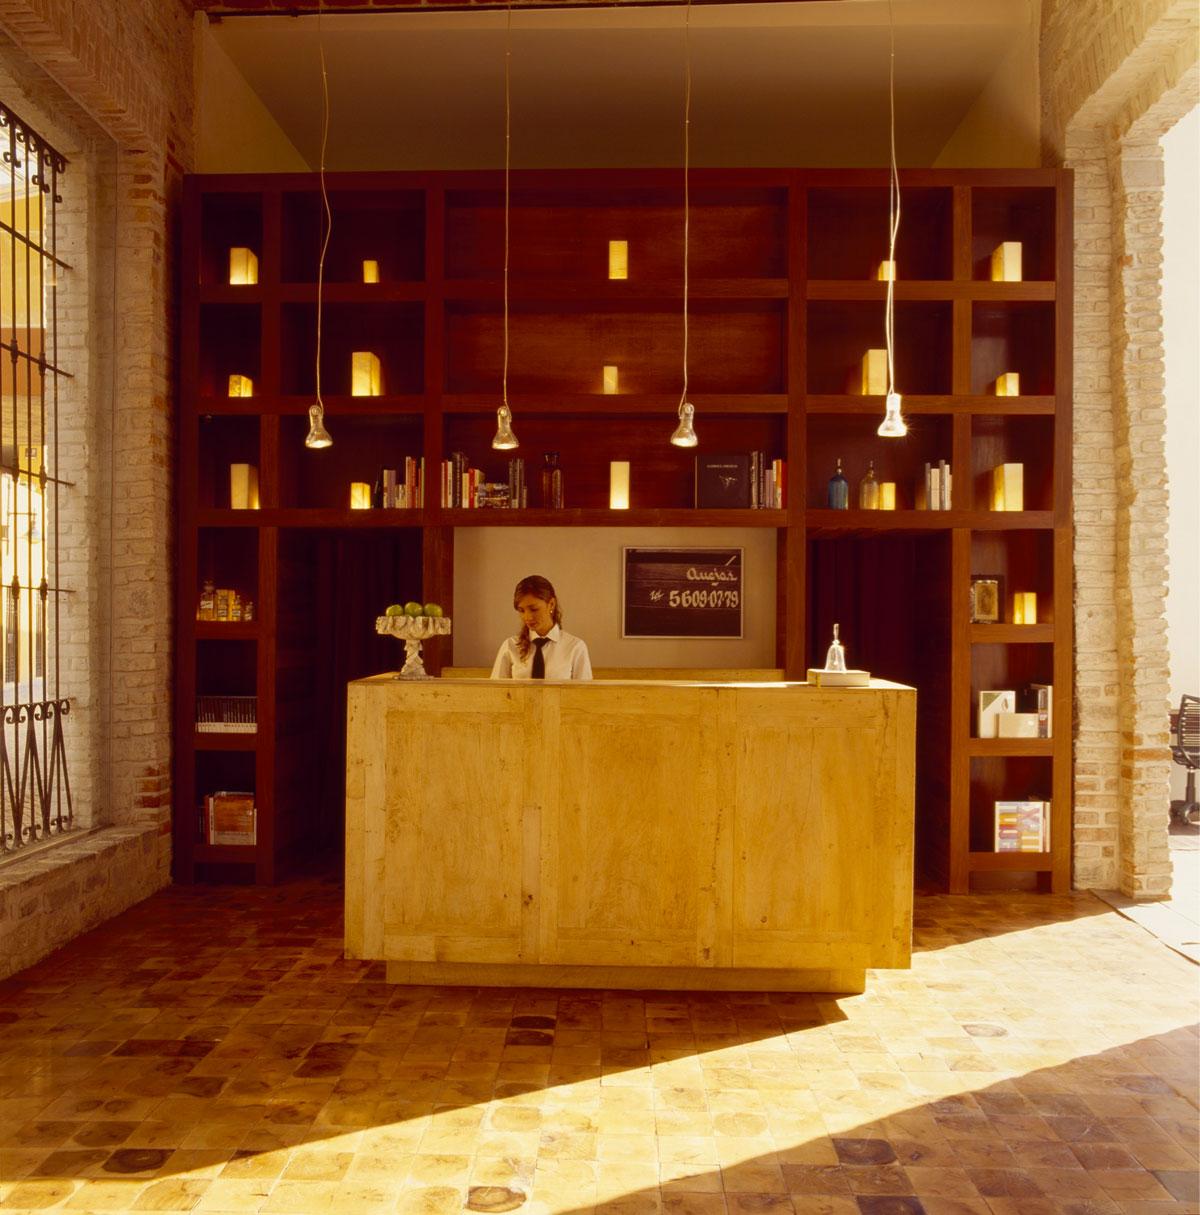 La Purificadora hotel puebla, отель пуэбла мексика, лофт отель мексика